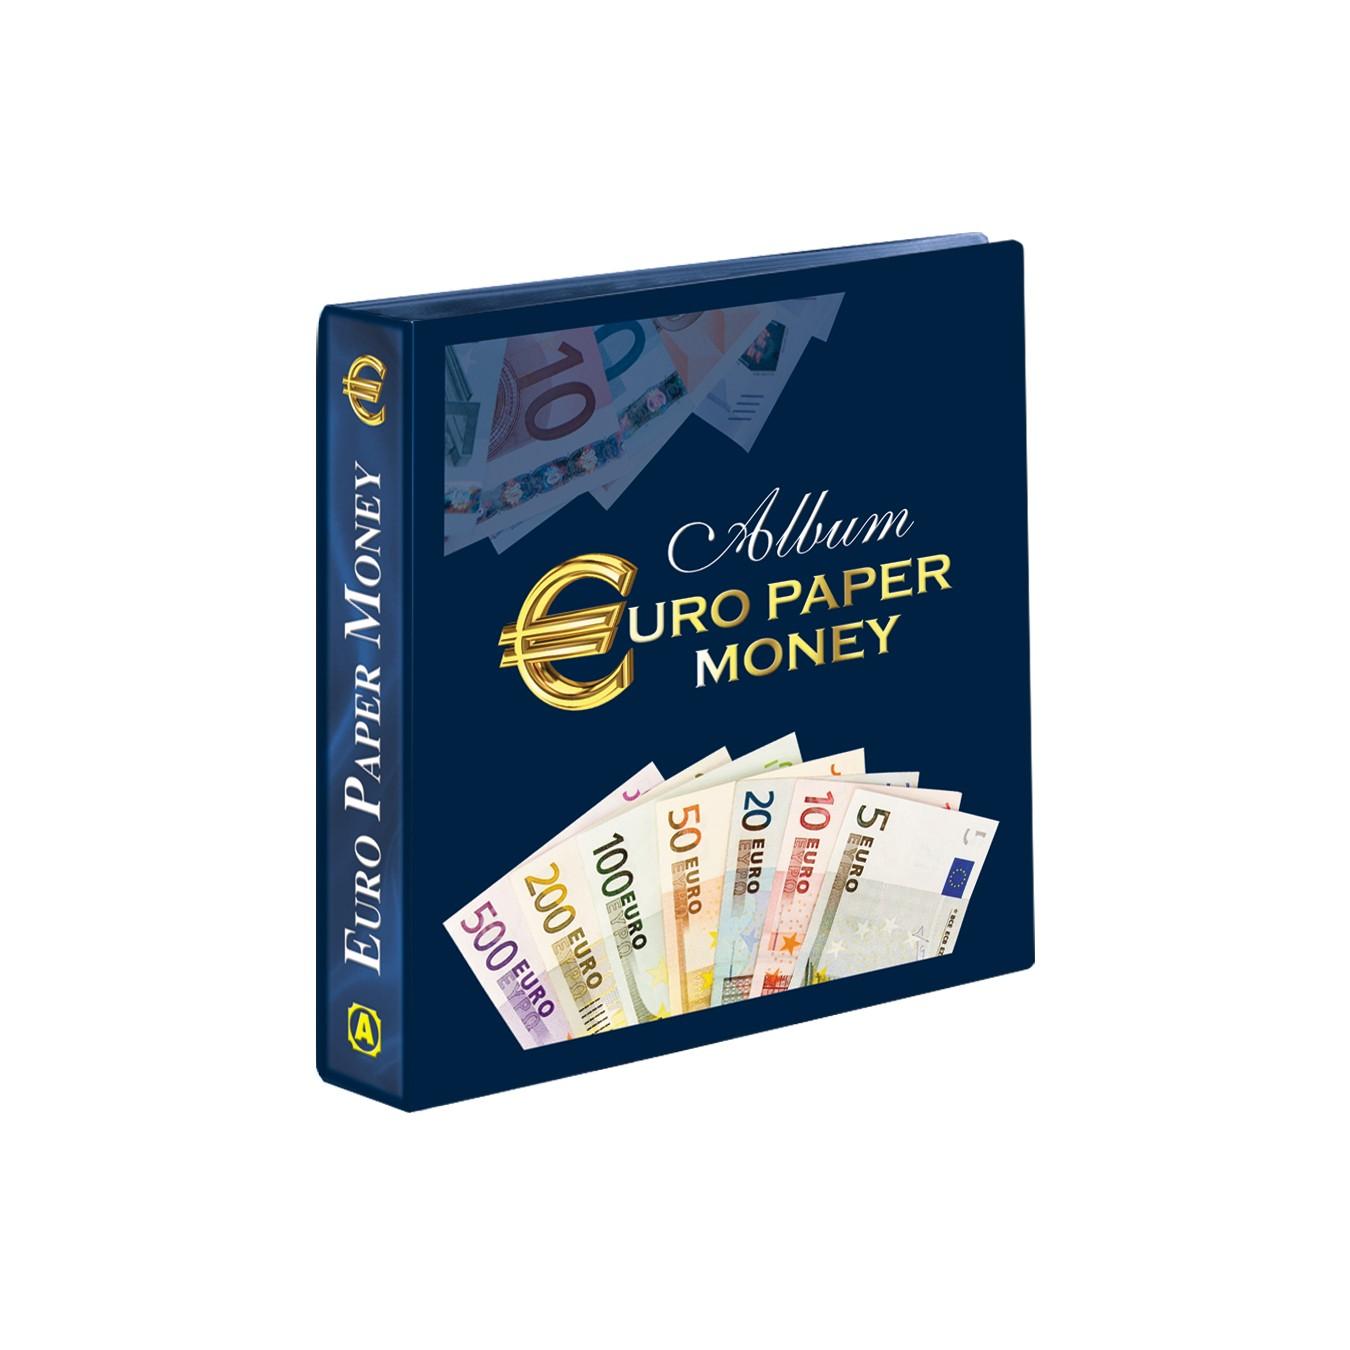 ALBUM EURO PAPER MONEY COMPLETO